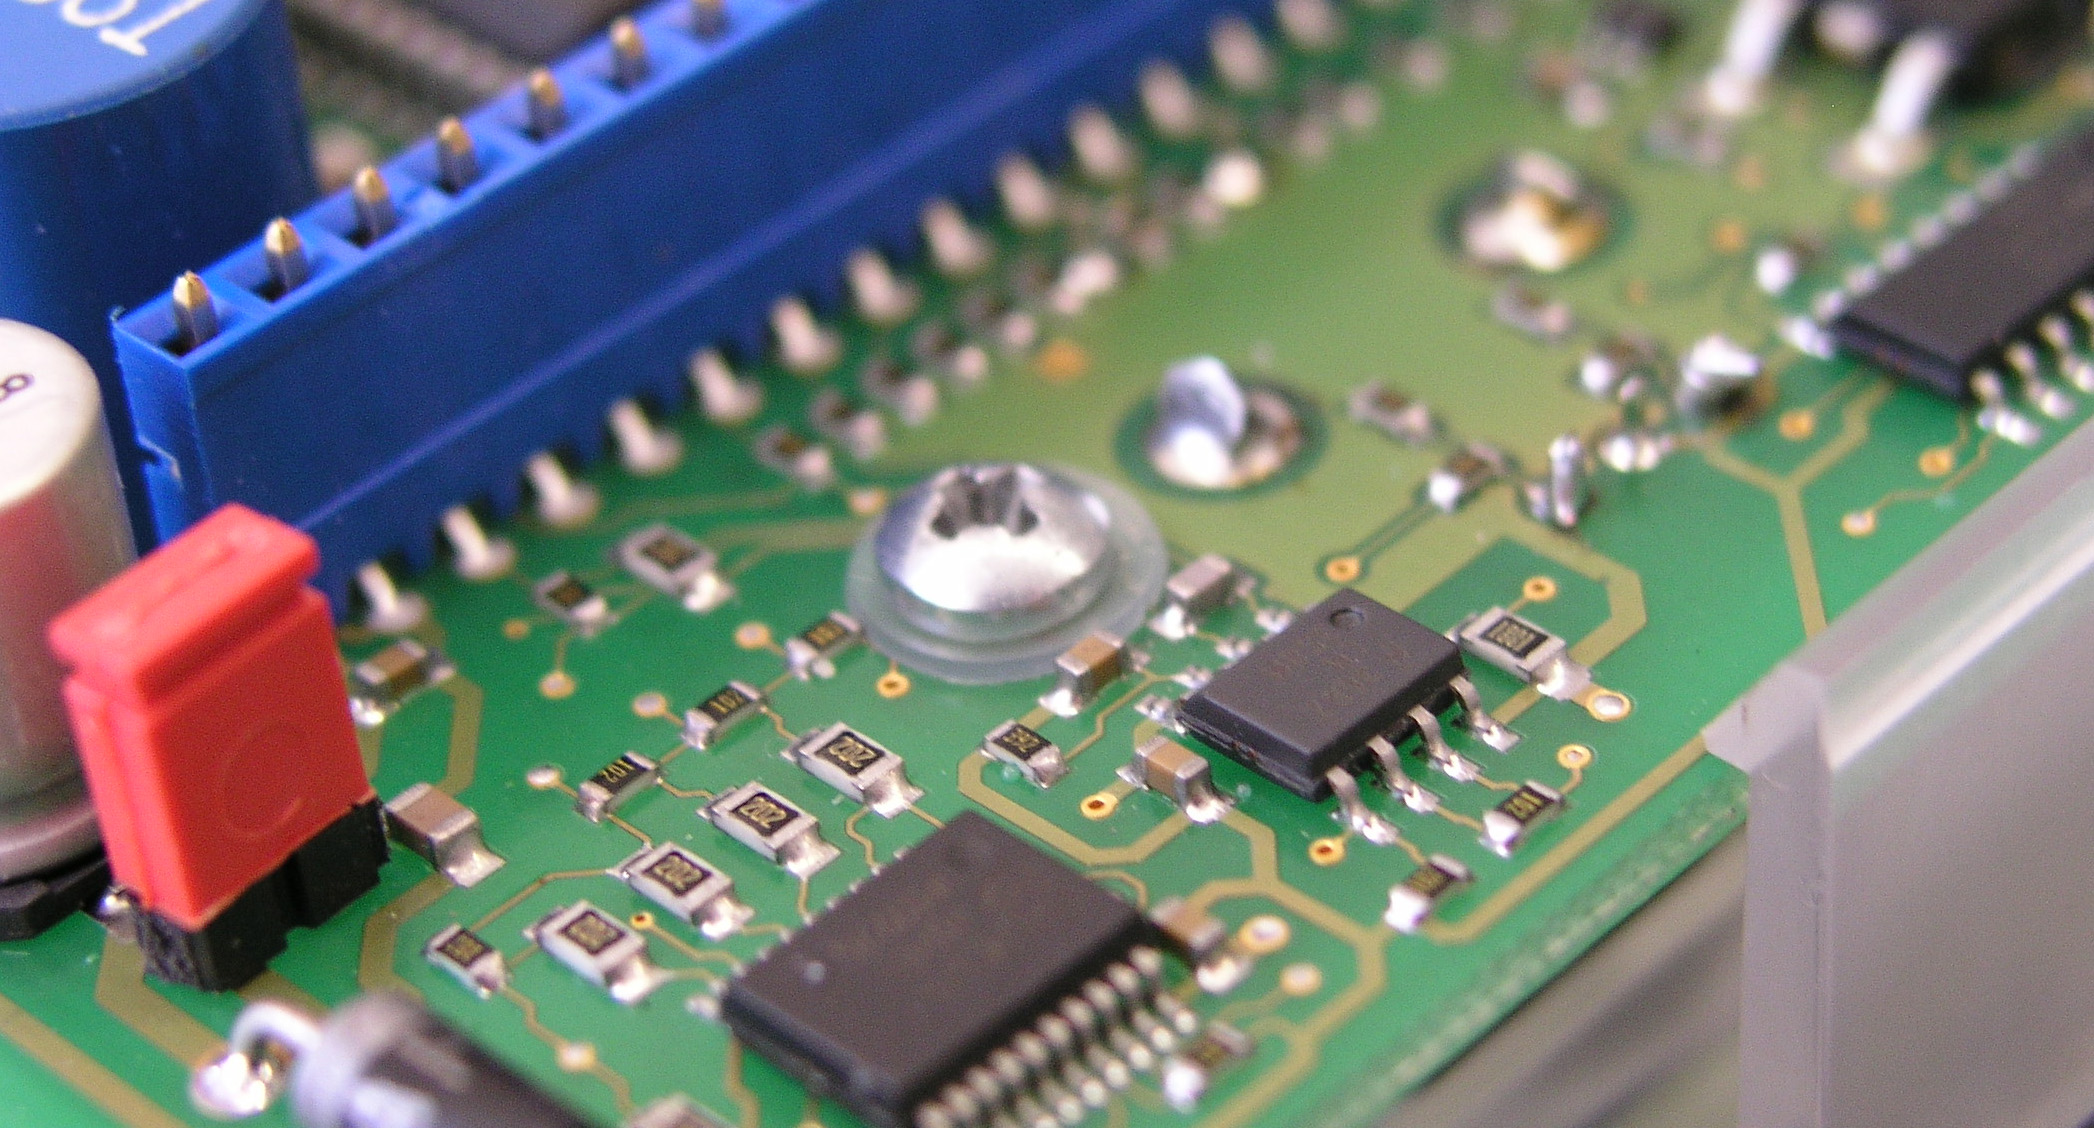 Dxxx Hmi Electronics Project Book 301 Circuits Pdf Free Applied Image